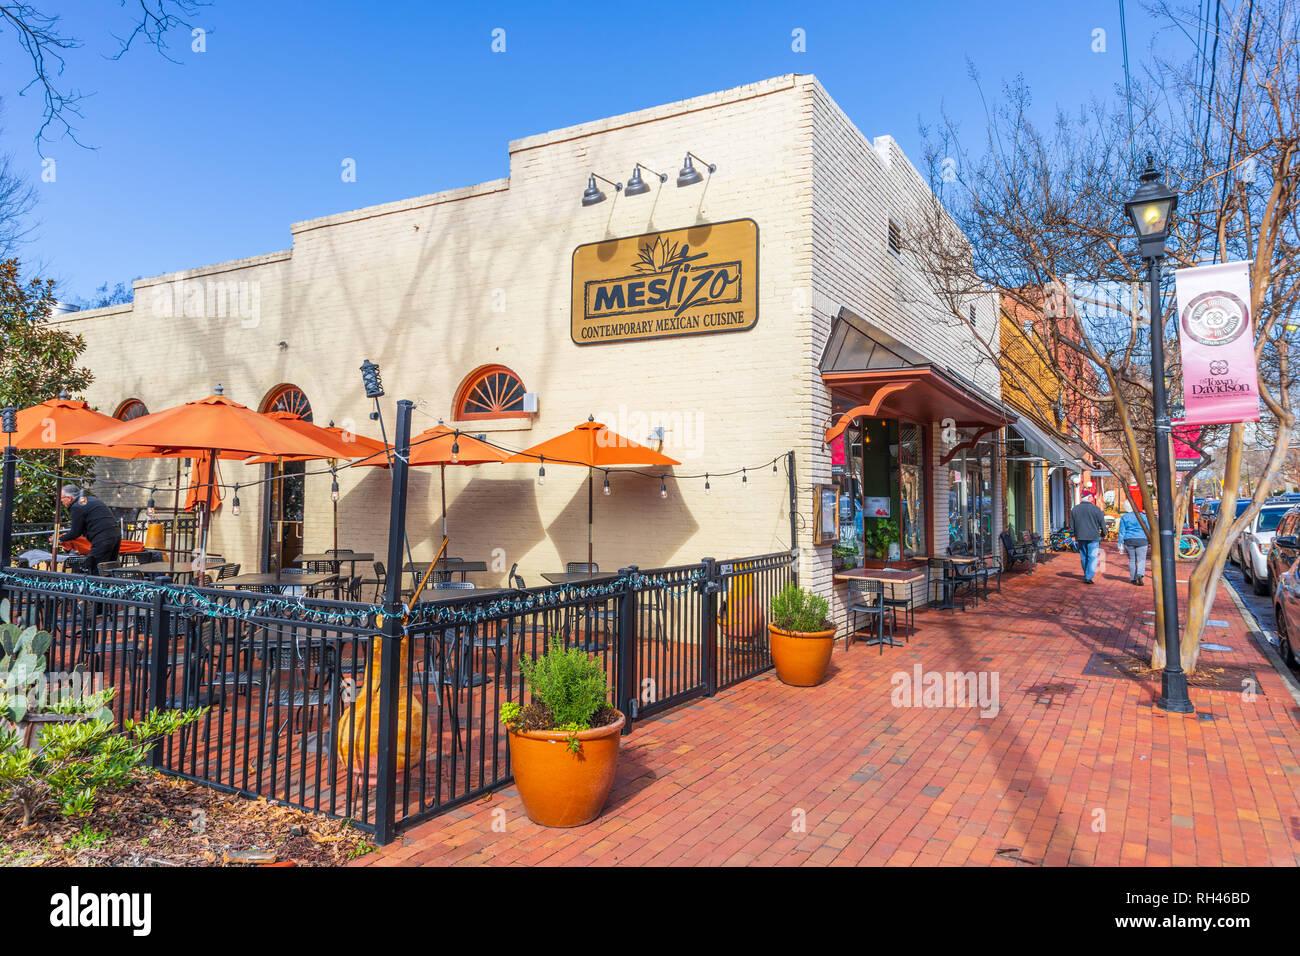 Davidson Nc Usa 1 24 19 The Mestizo Restaurant Featuring